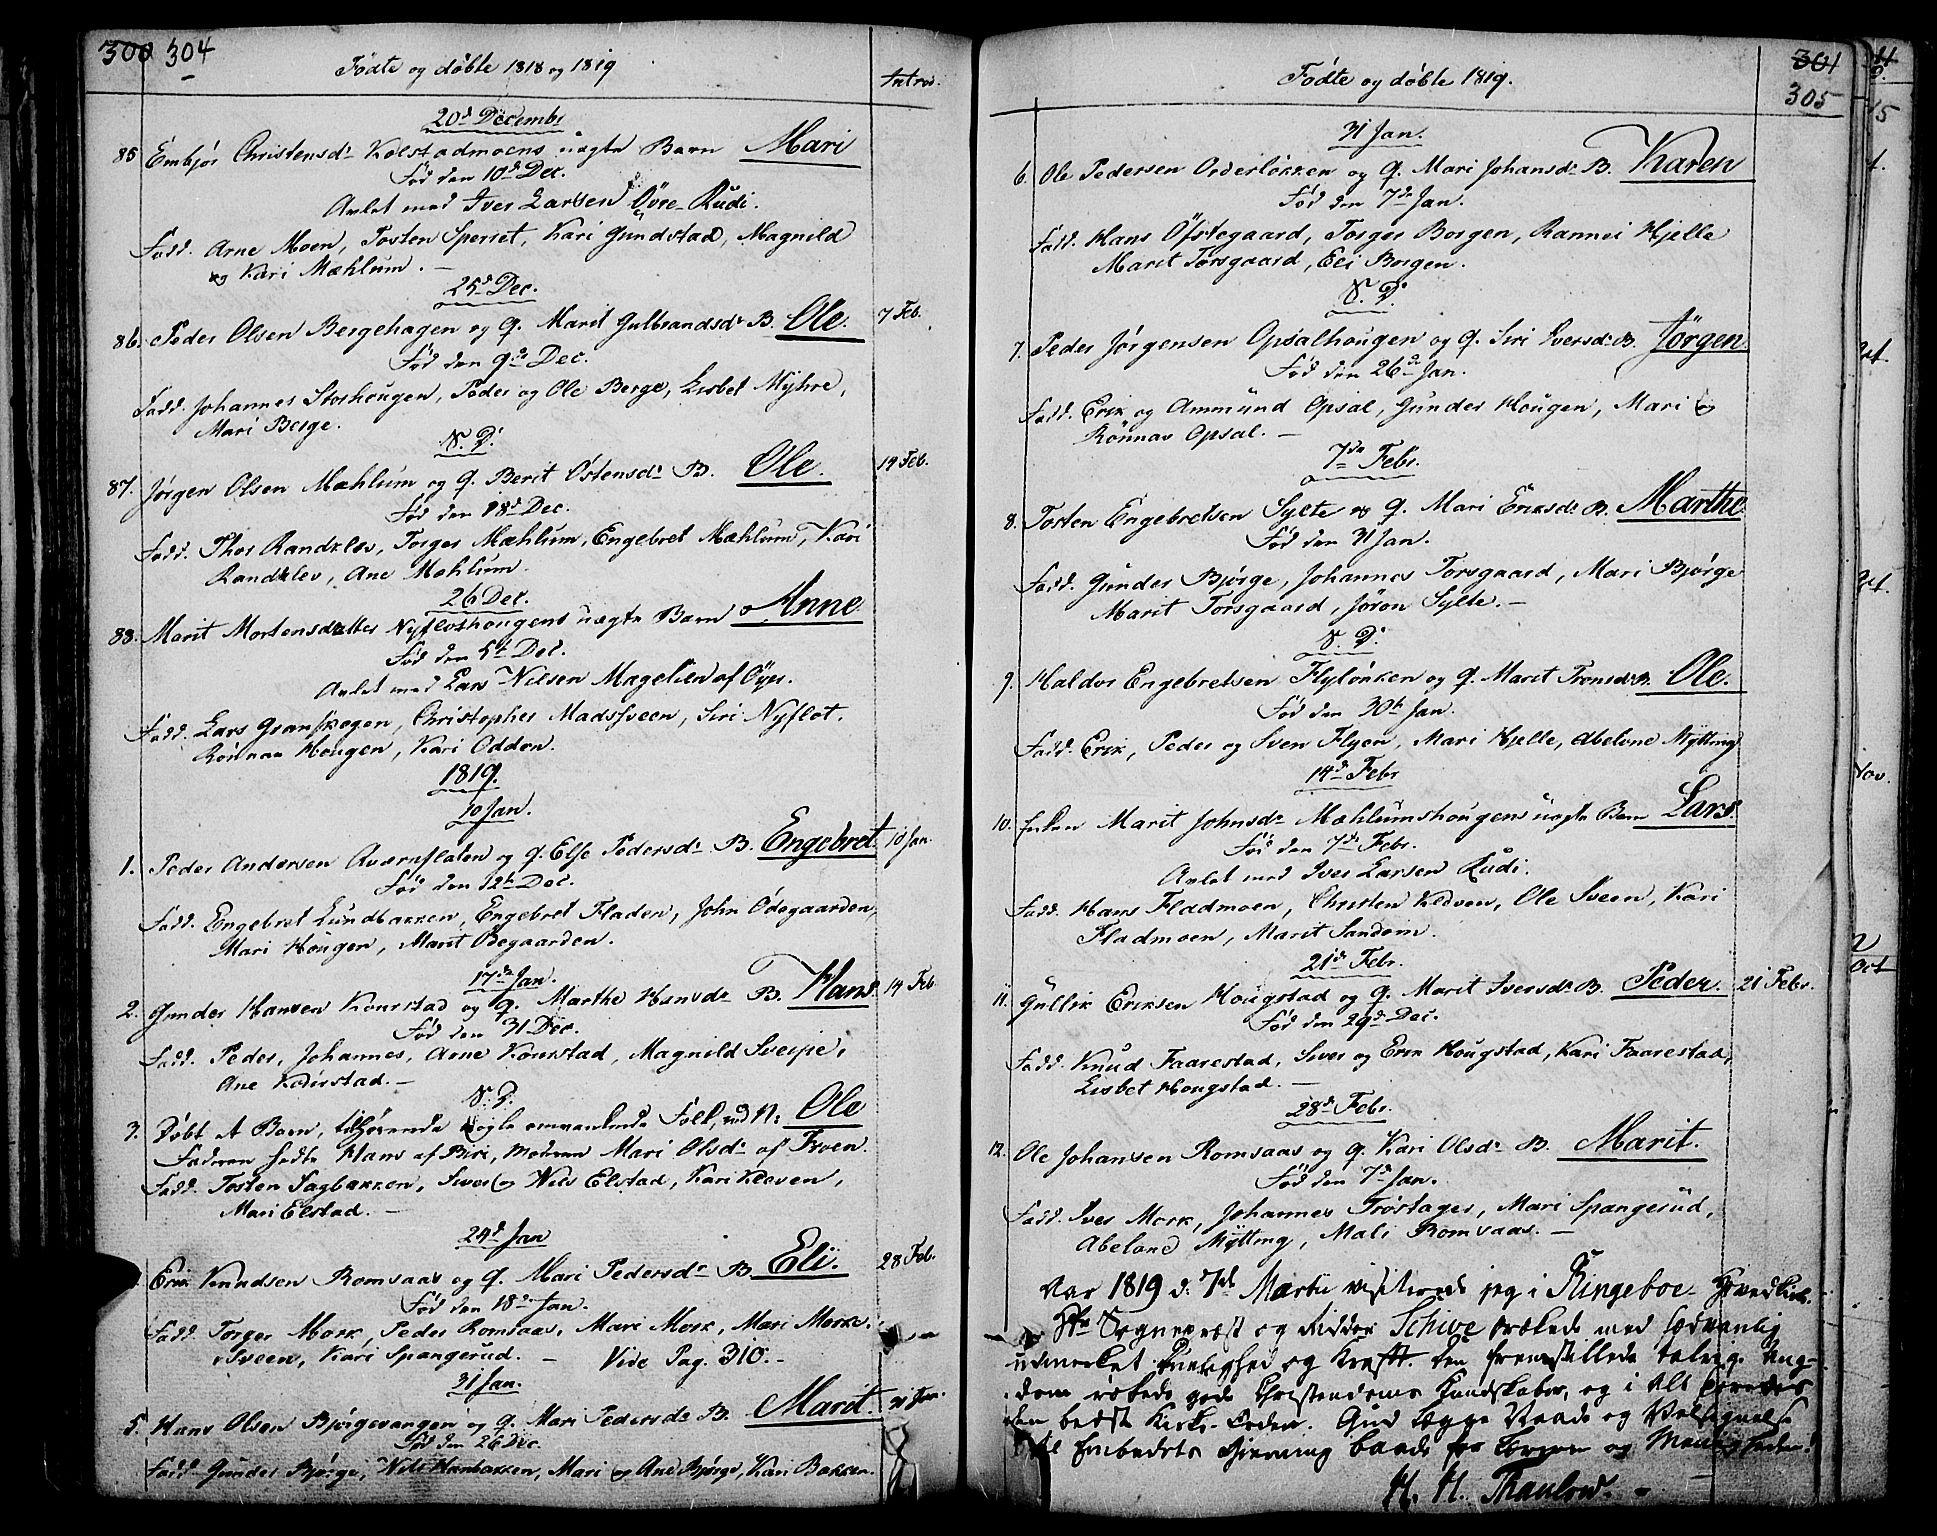 SAH, Ringebu prestekontor, Ministerialbok nr. 3, 1781-1820, s. 304-305